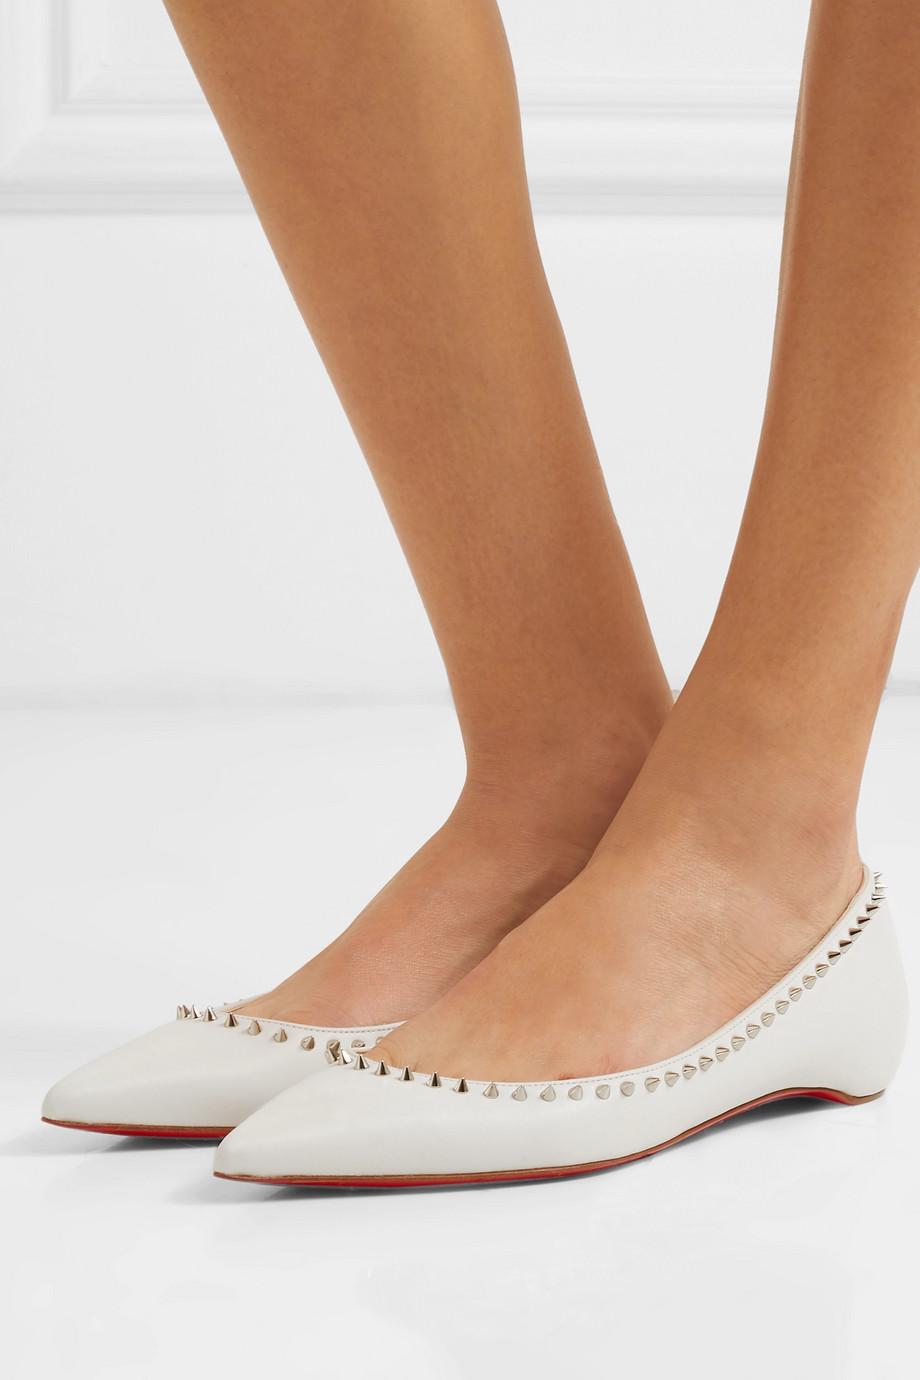 Christian Louboutin Anjalina studded leather point-toe flats